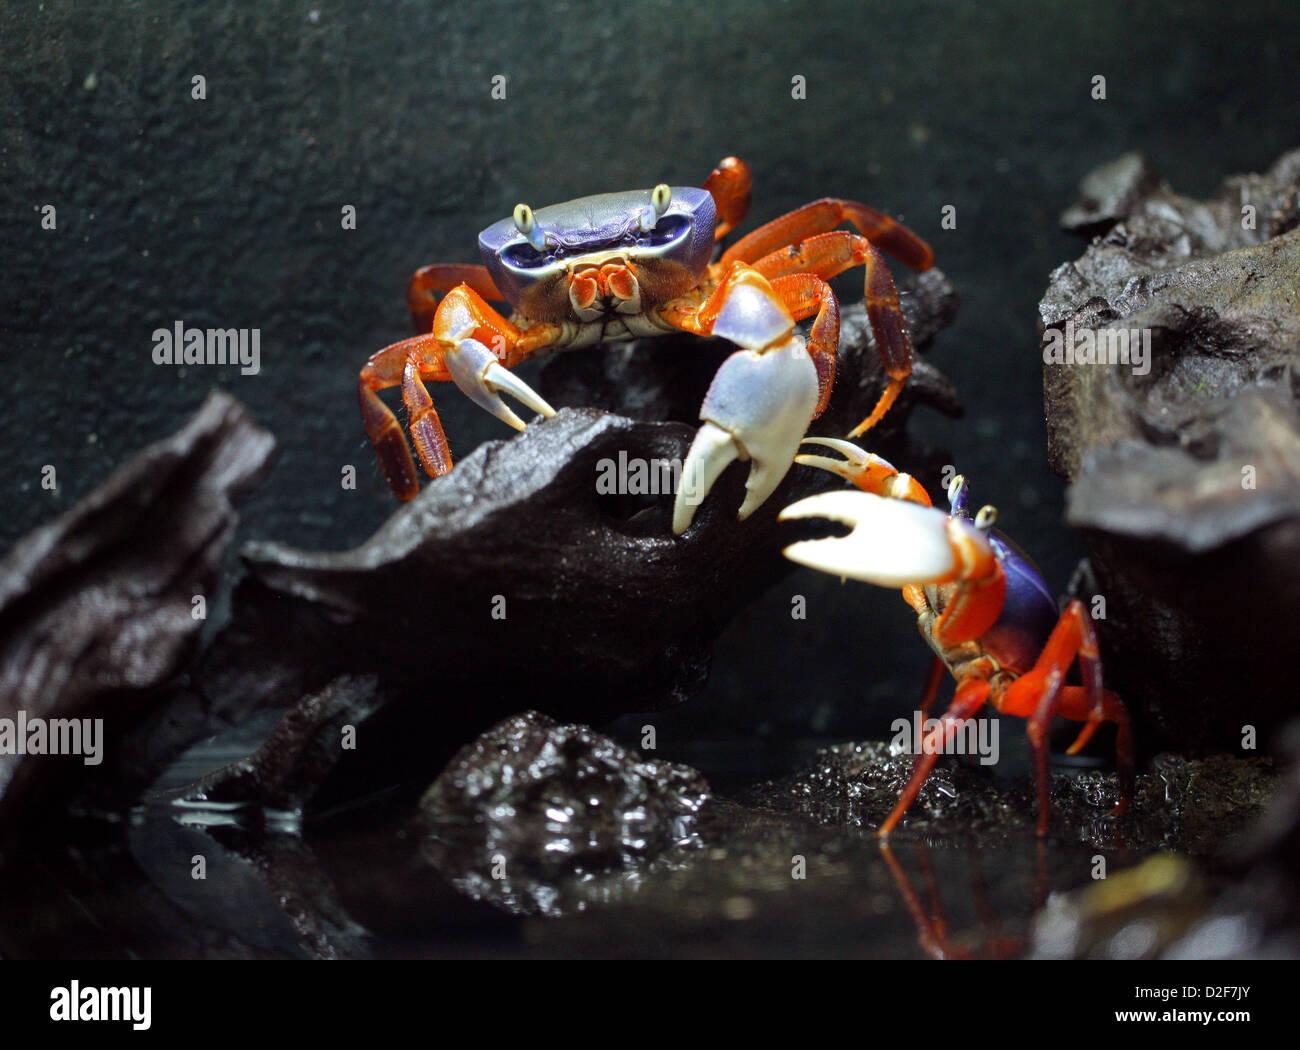 Rainbow Crabs, Potamon anomalus, Potamidae, Crustacea. Nigeria, West Africa. Colourful Freshwater Crabs. - Stock Image